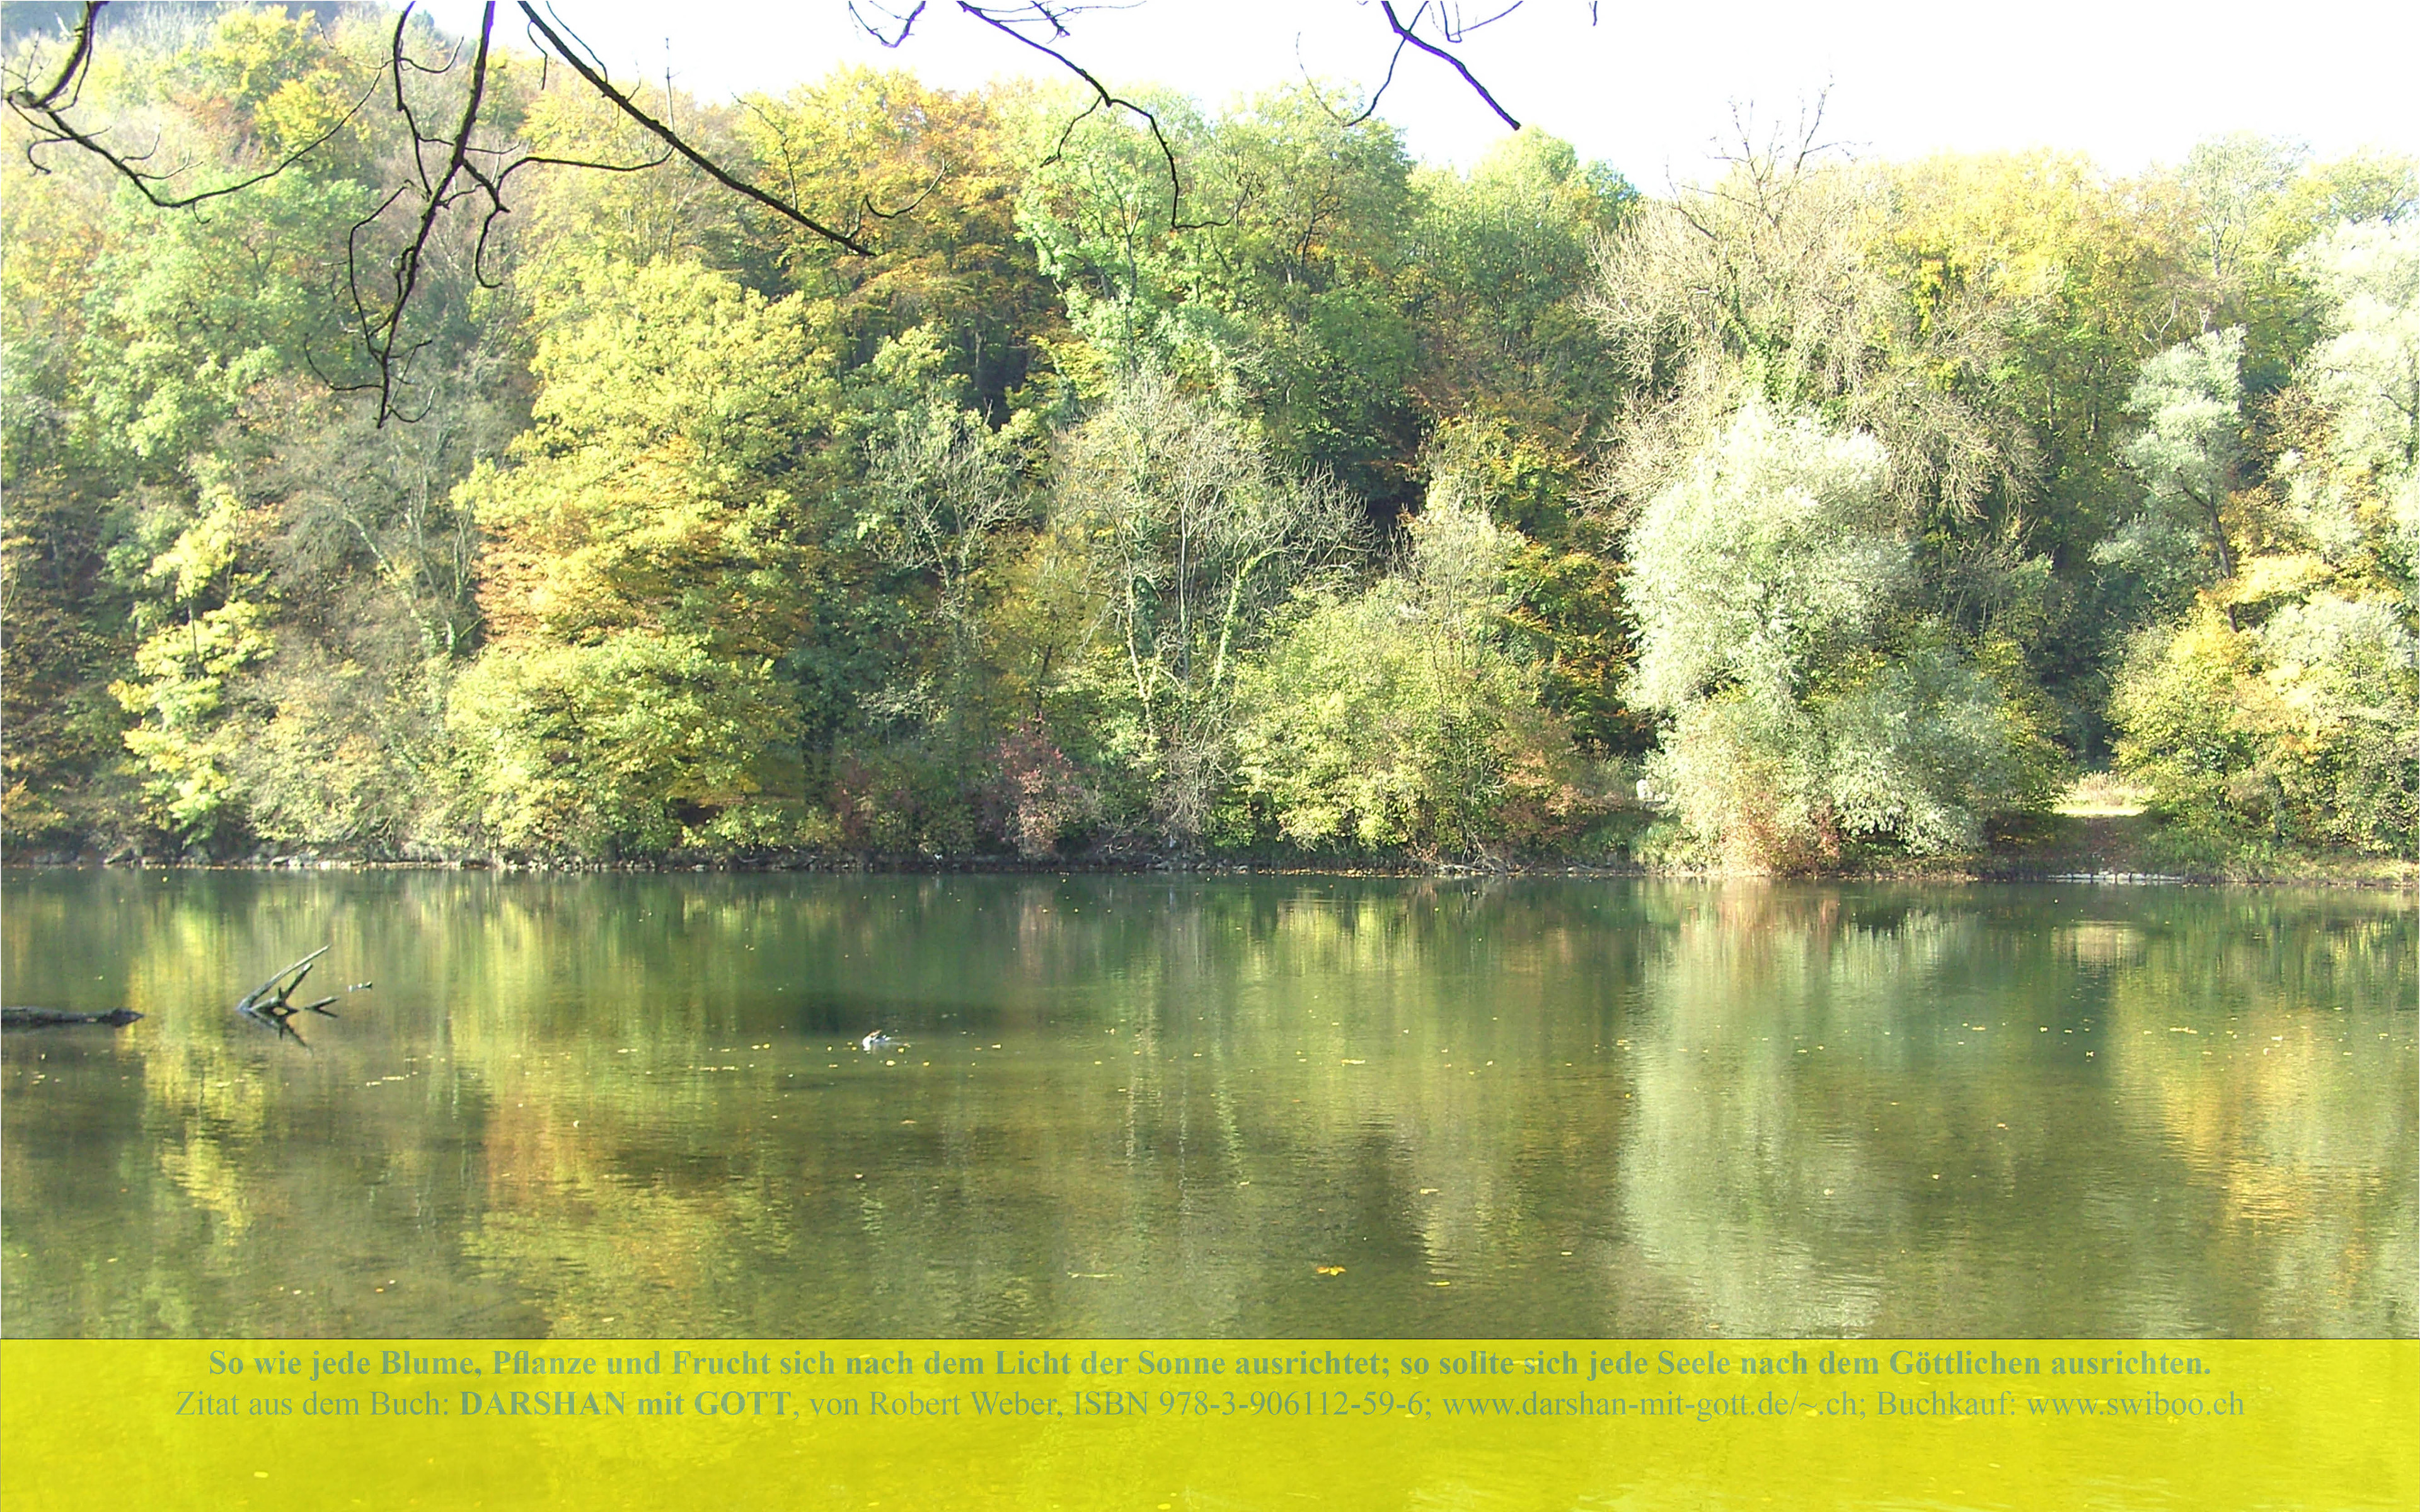 DARSHAN mit GOTT: So wie jede Blume, ..., Aare-Flusslandschaft